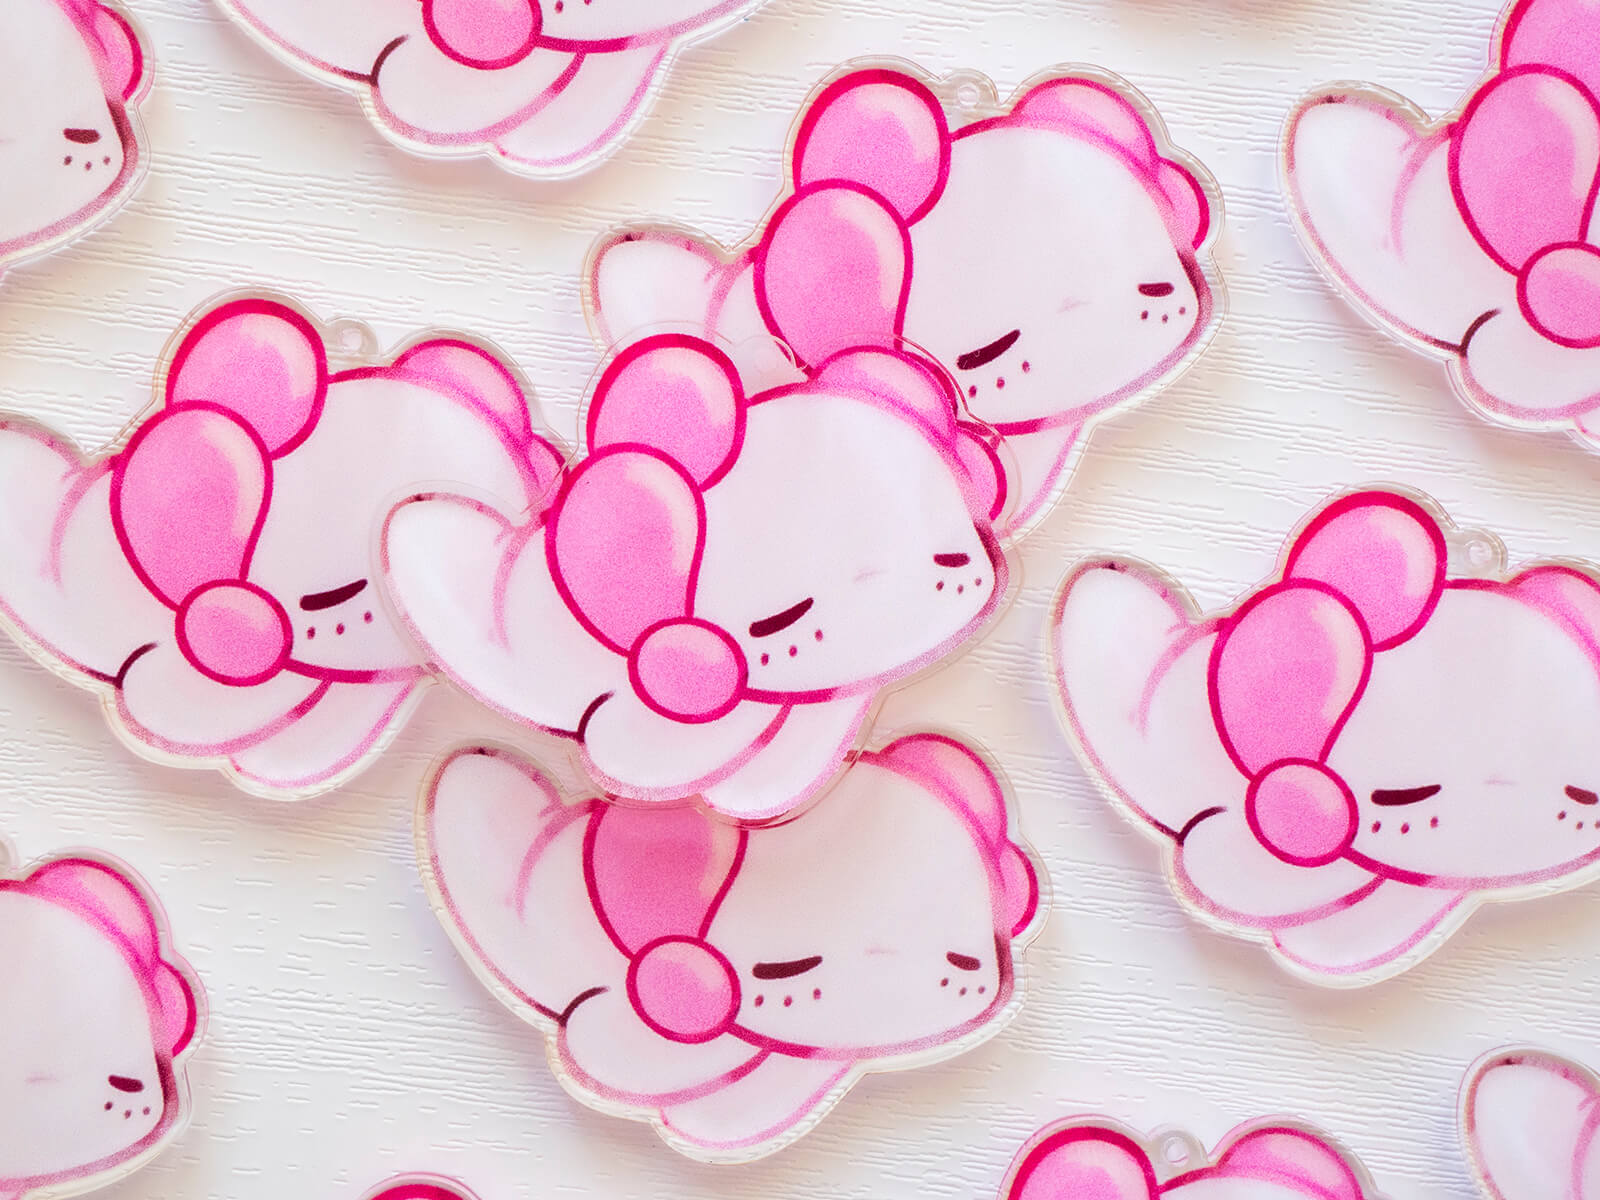 Pink kawaii charms featuring Lottie the axolotl